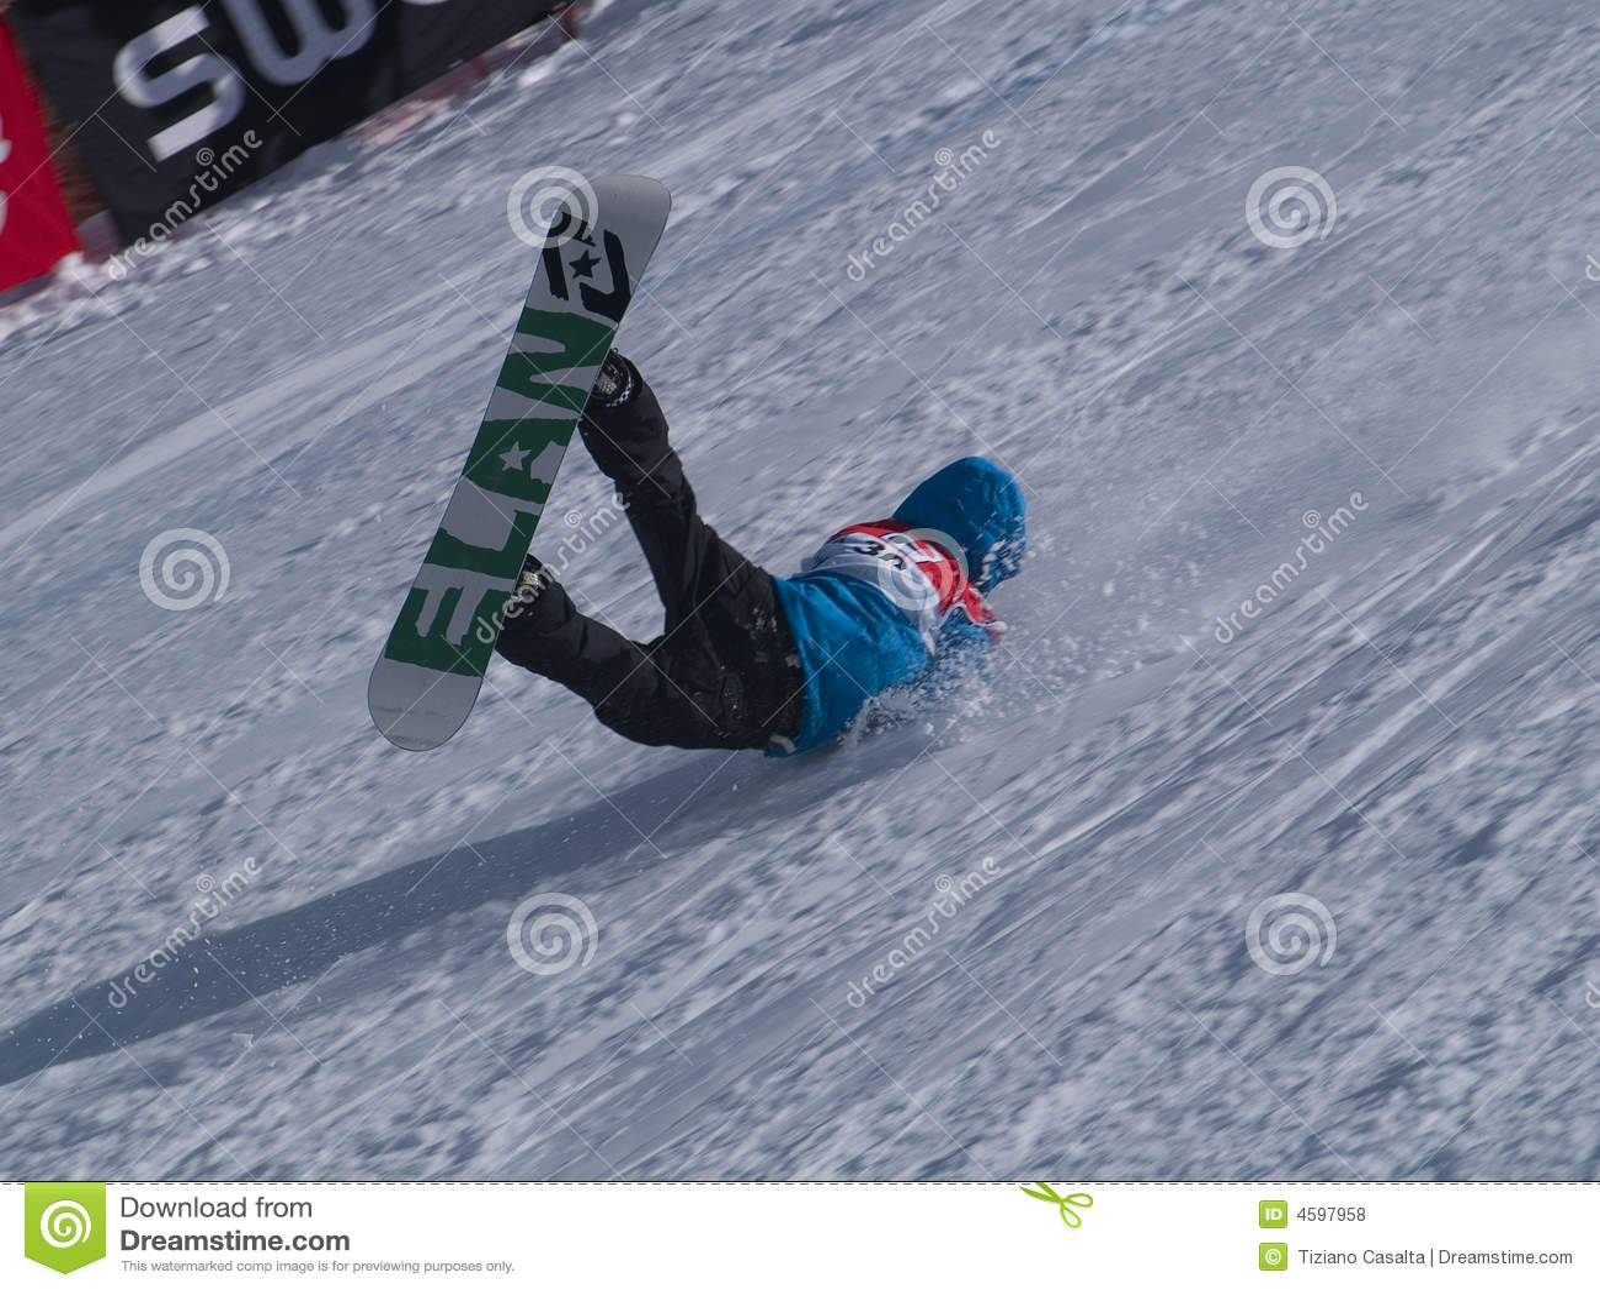 Snowboarding Fall Broken Editorial Stock Photo Image